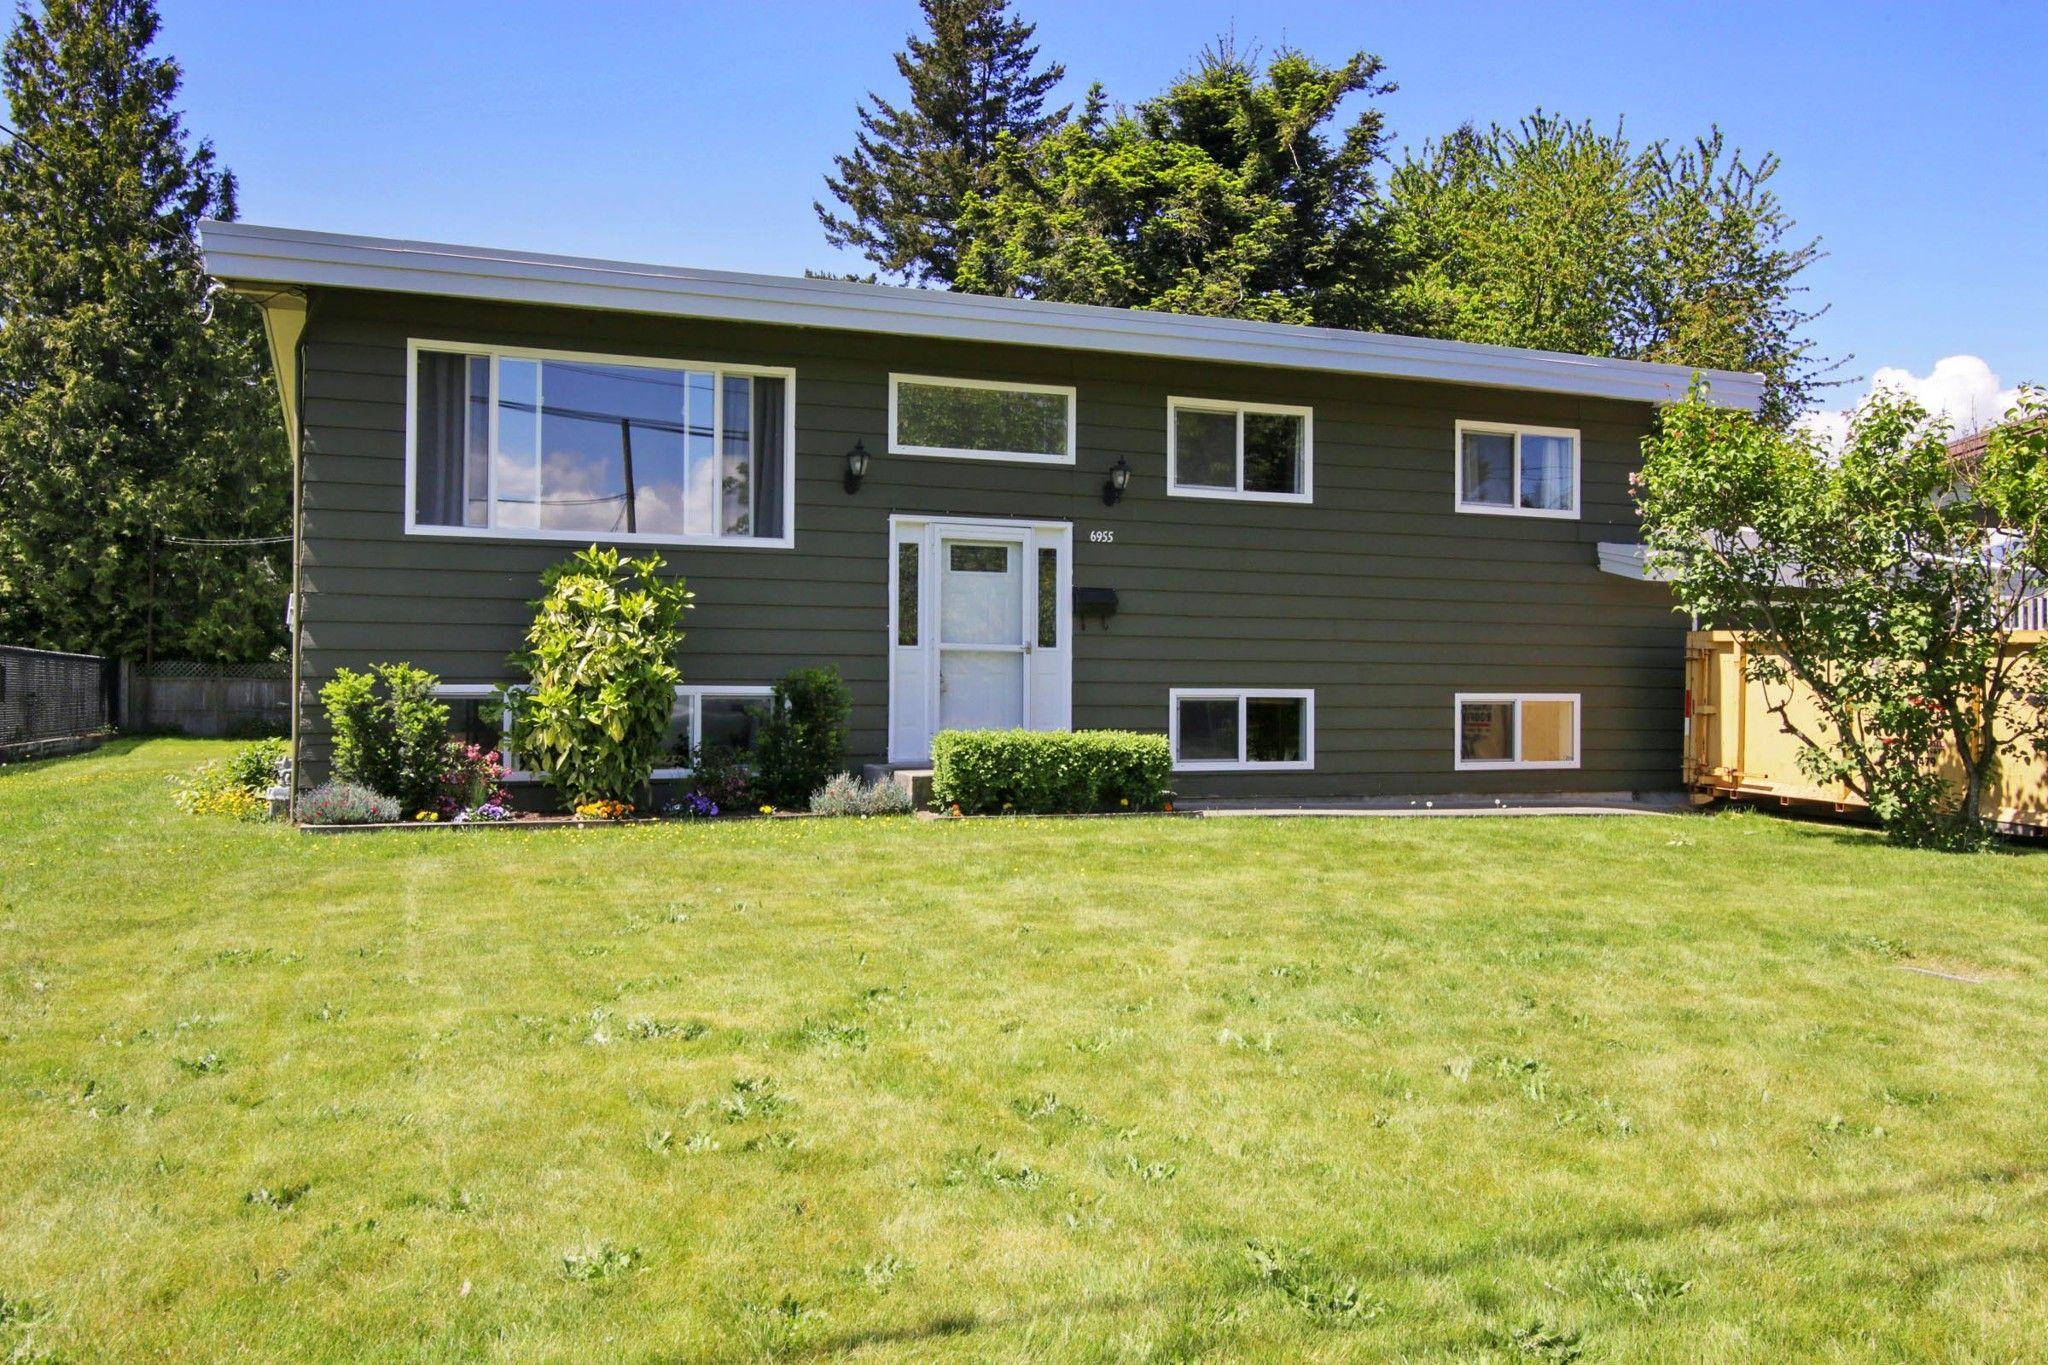 Main Photo: 6955 CENTENNIAL Drive in Chilliwack: Sardis East Vedder Rd House for sale (Sardis)  : MLS®# R2580834